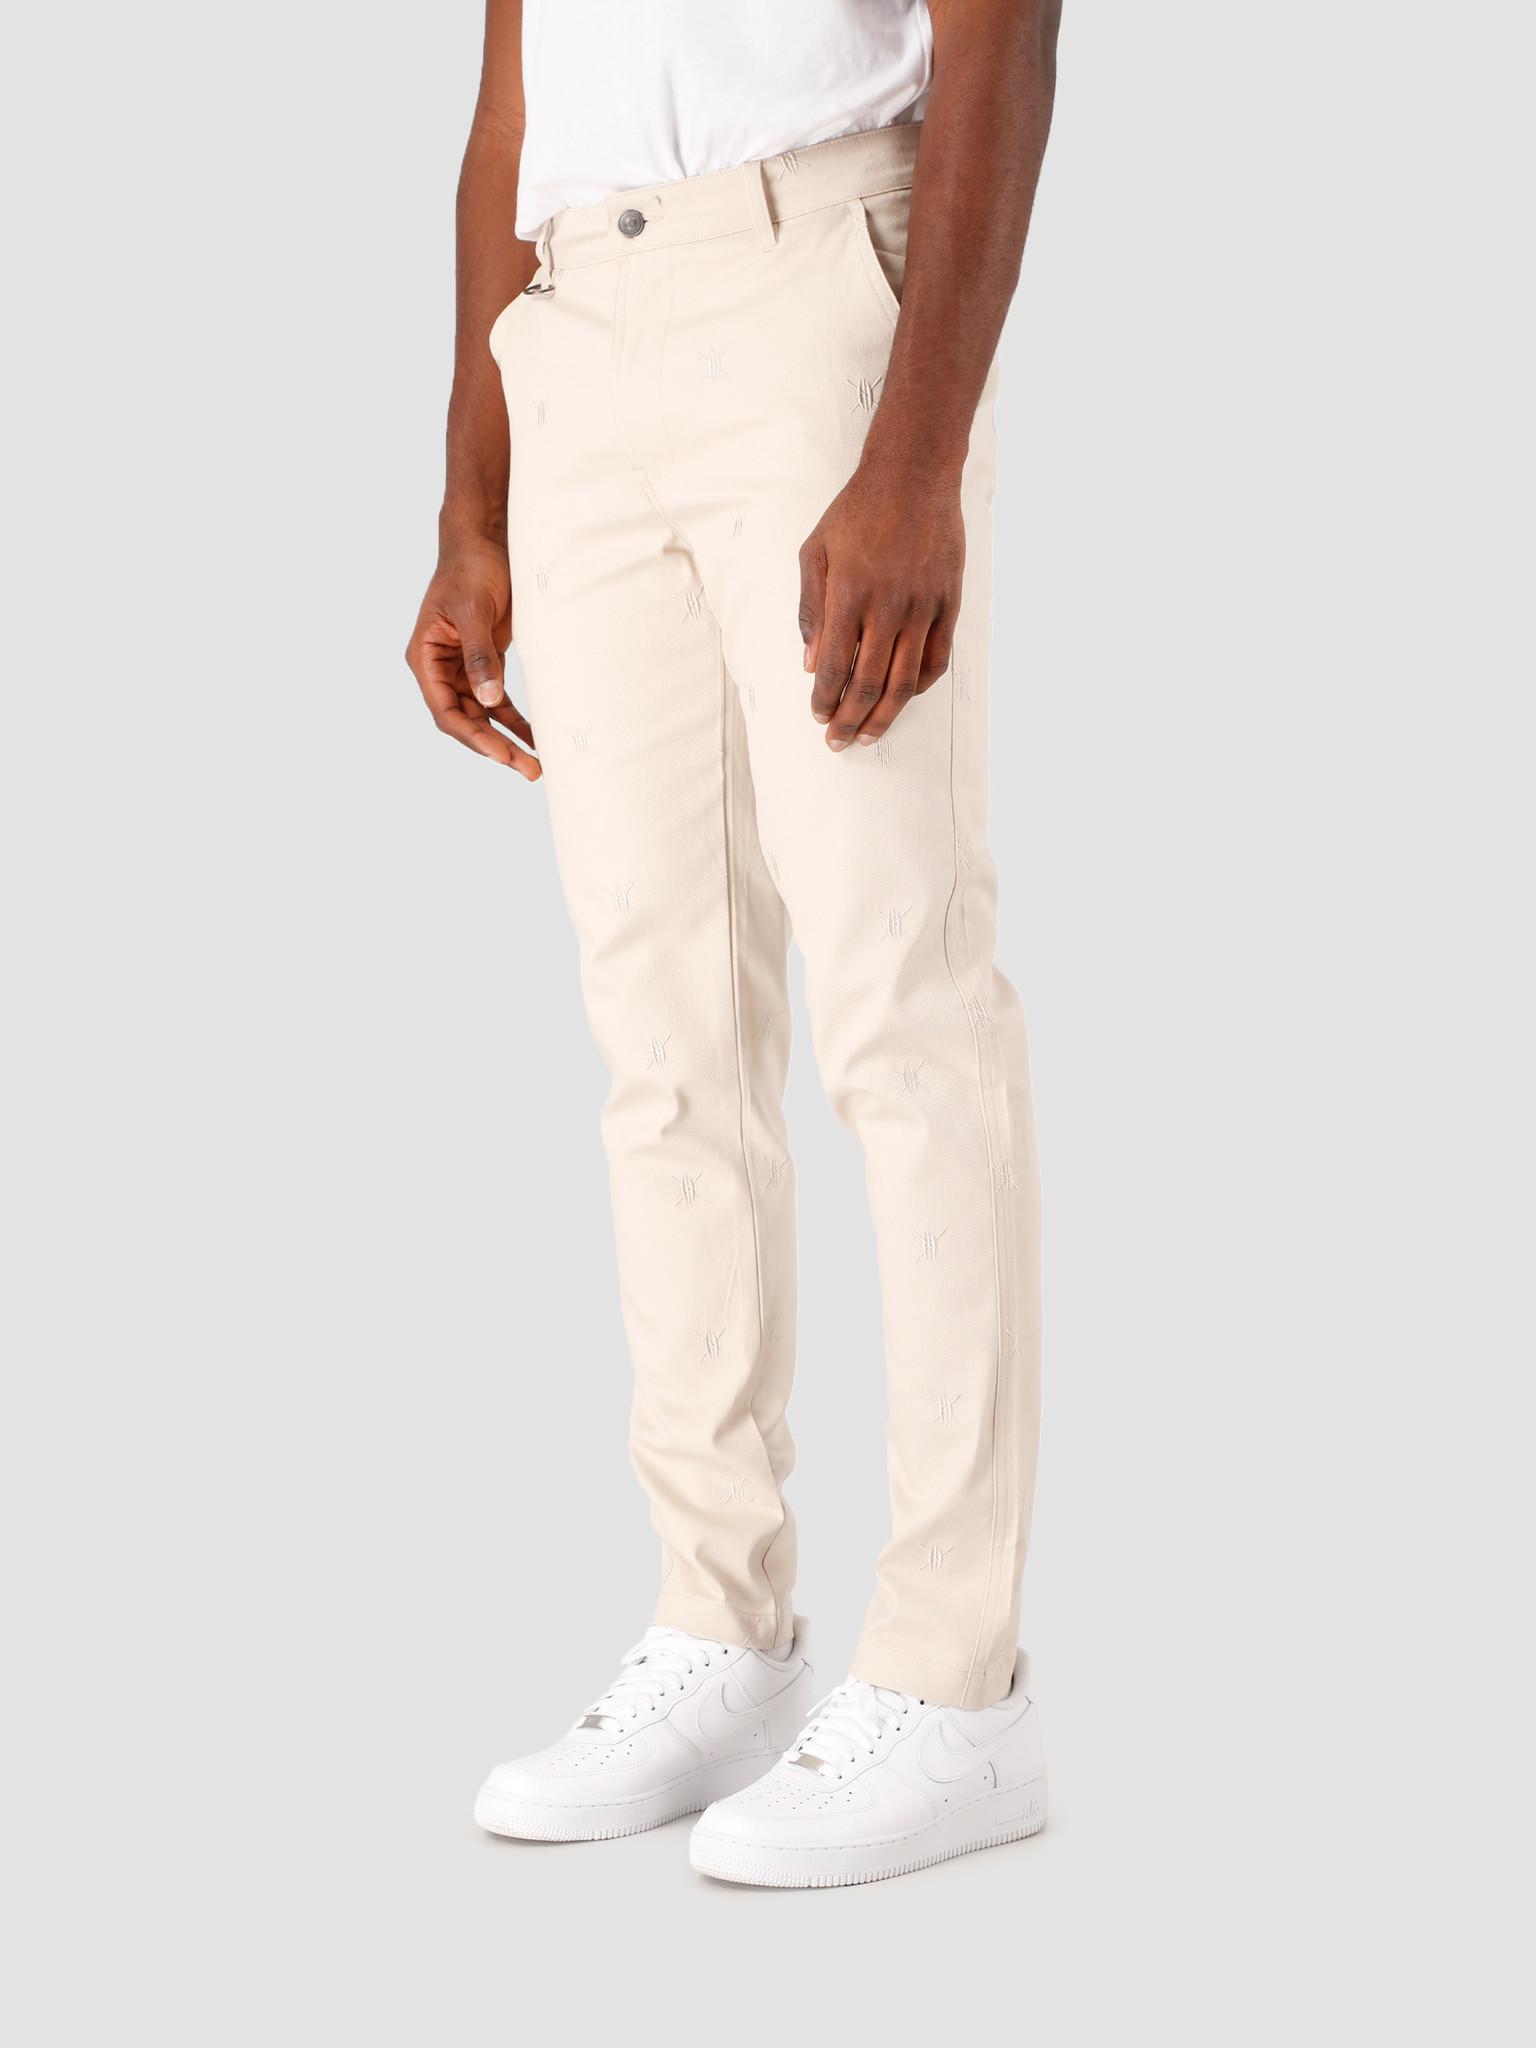 Daily Paper Daily Paper Kenya Pants Kenya Pants Moonbeam Beige 20E1PA01-01